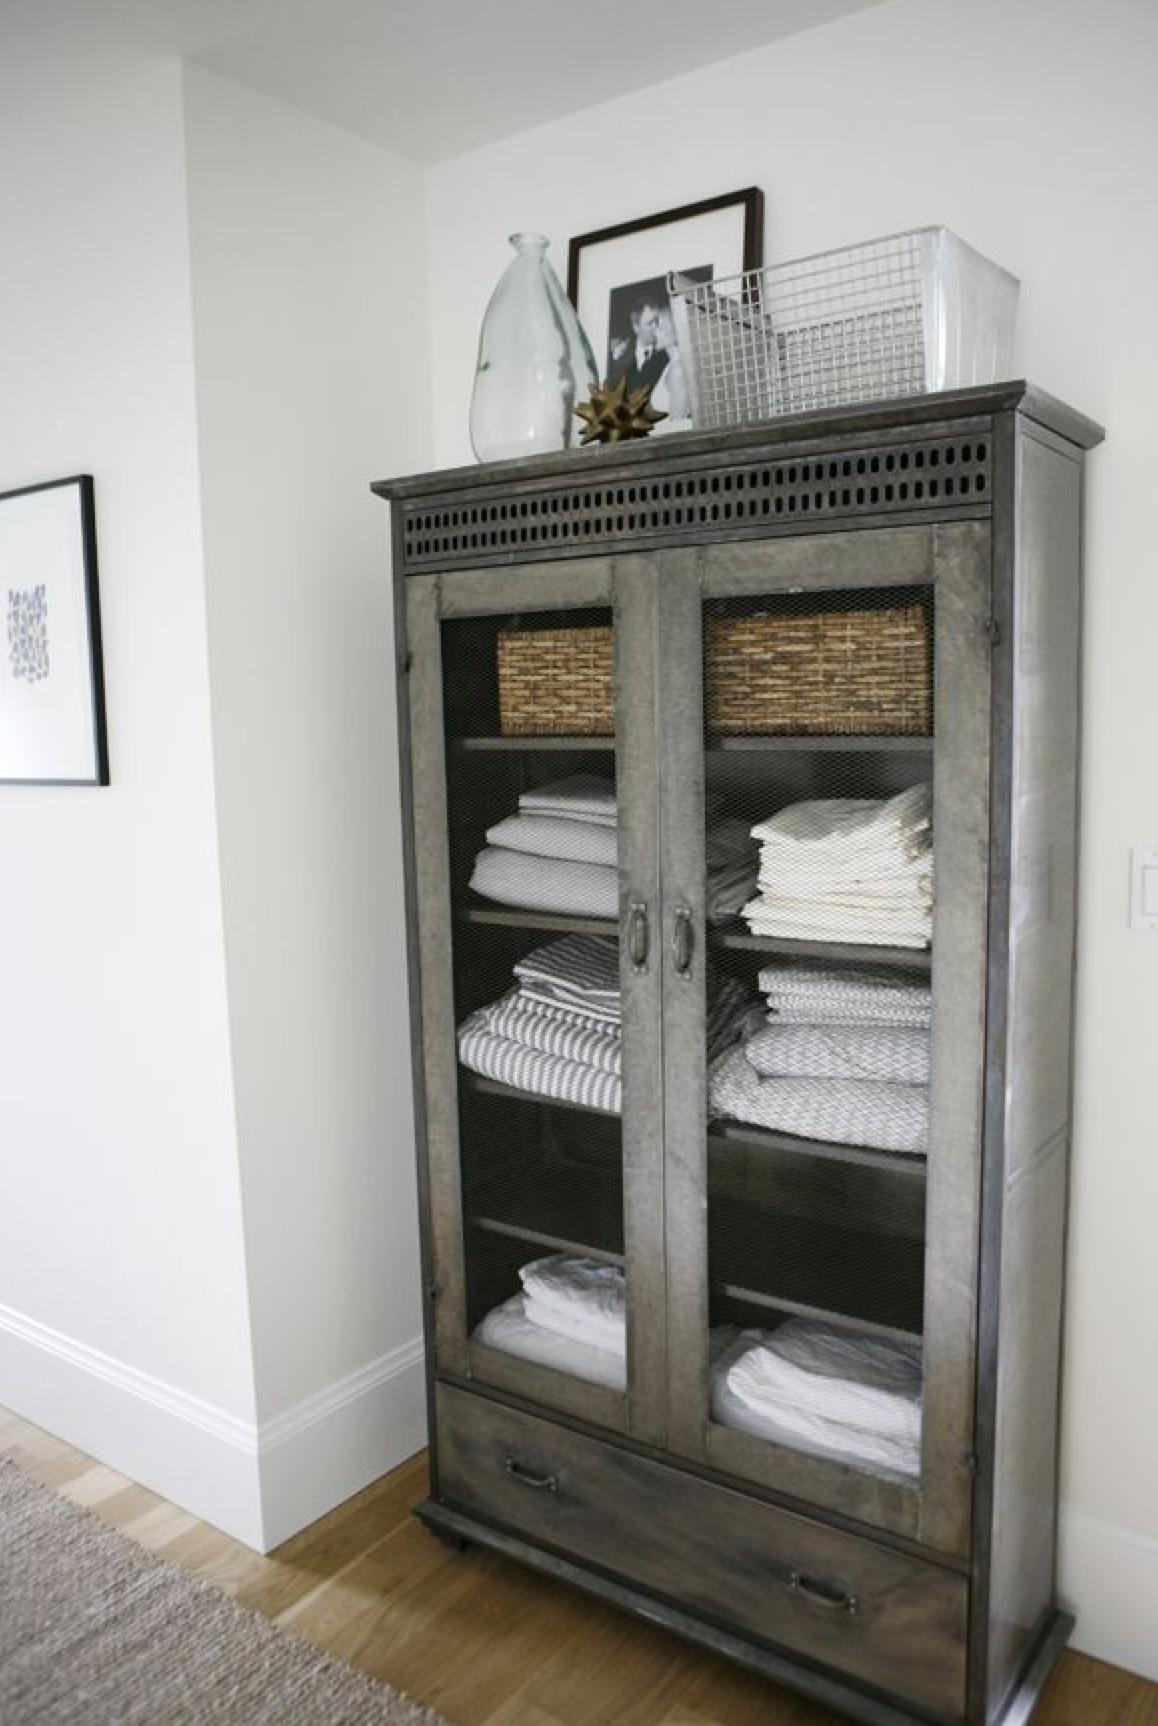 Open cupboards diy pinterest muebles ba os and hogar for Gabinete de almacenamiento de bano barato